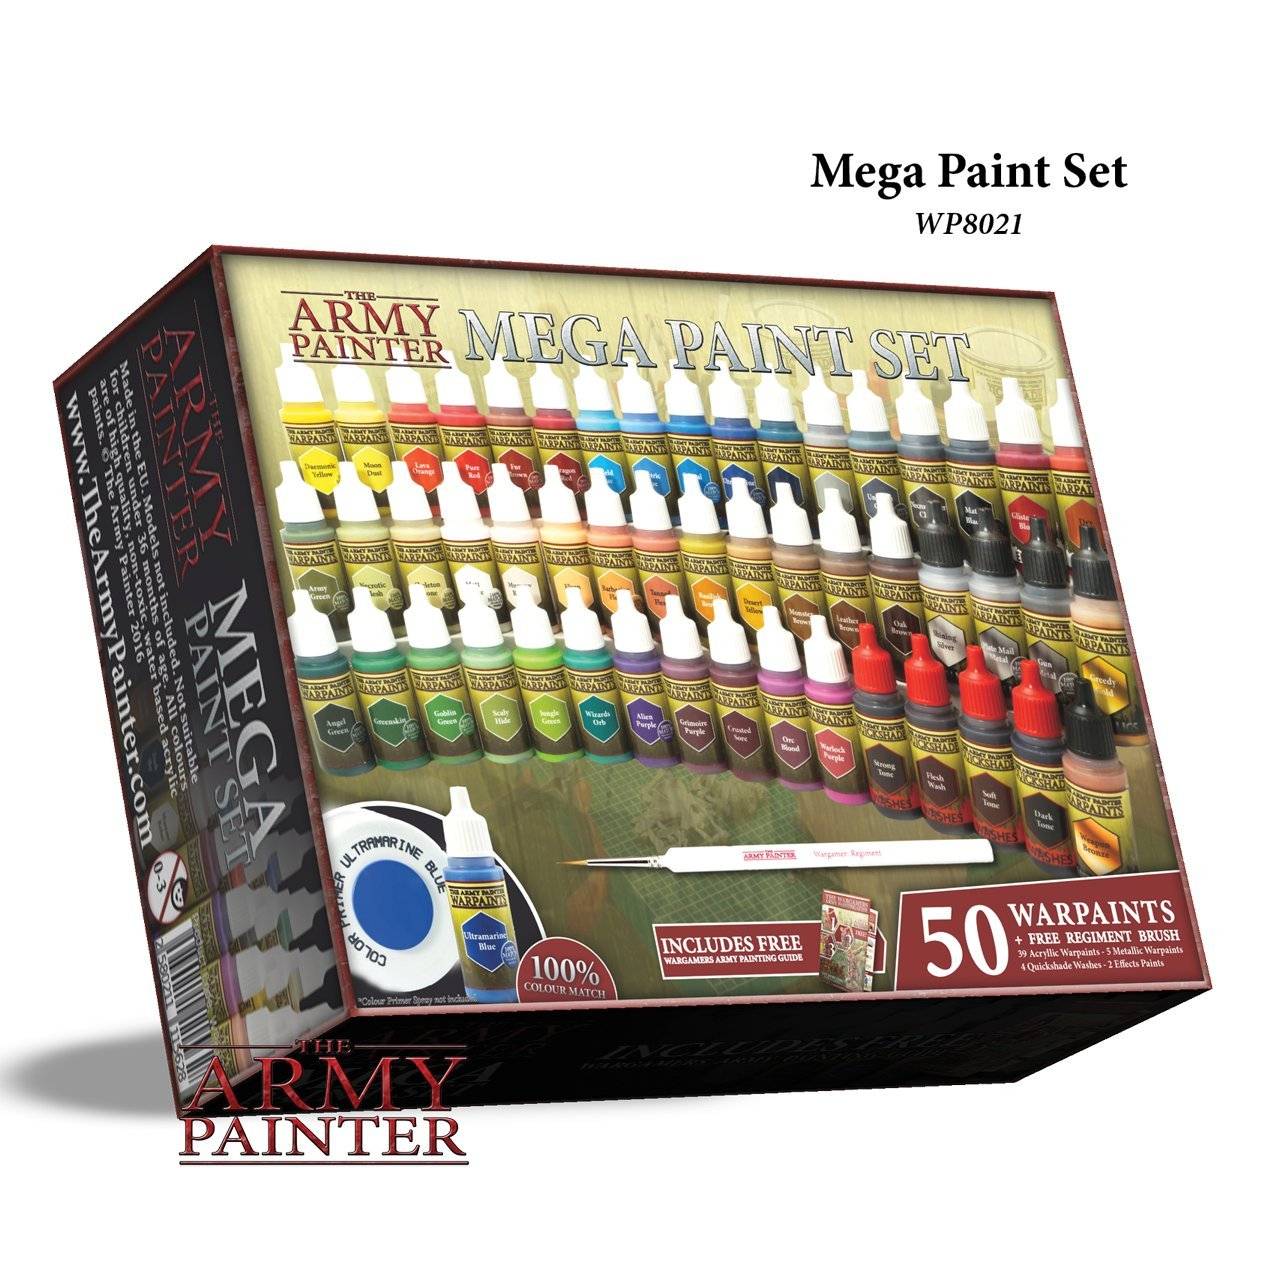 Miniature Painting Kit with Wargamer Regiment Miniatures Paint Brush - Miniature Paint Set for Miniature Figures, 50 Nontoxic Model Paints - Mega Paint Set 3 by The Army Painter